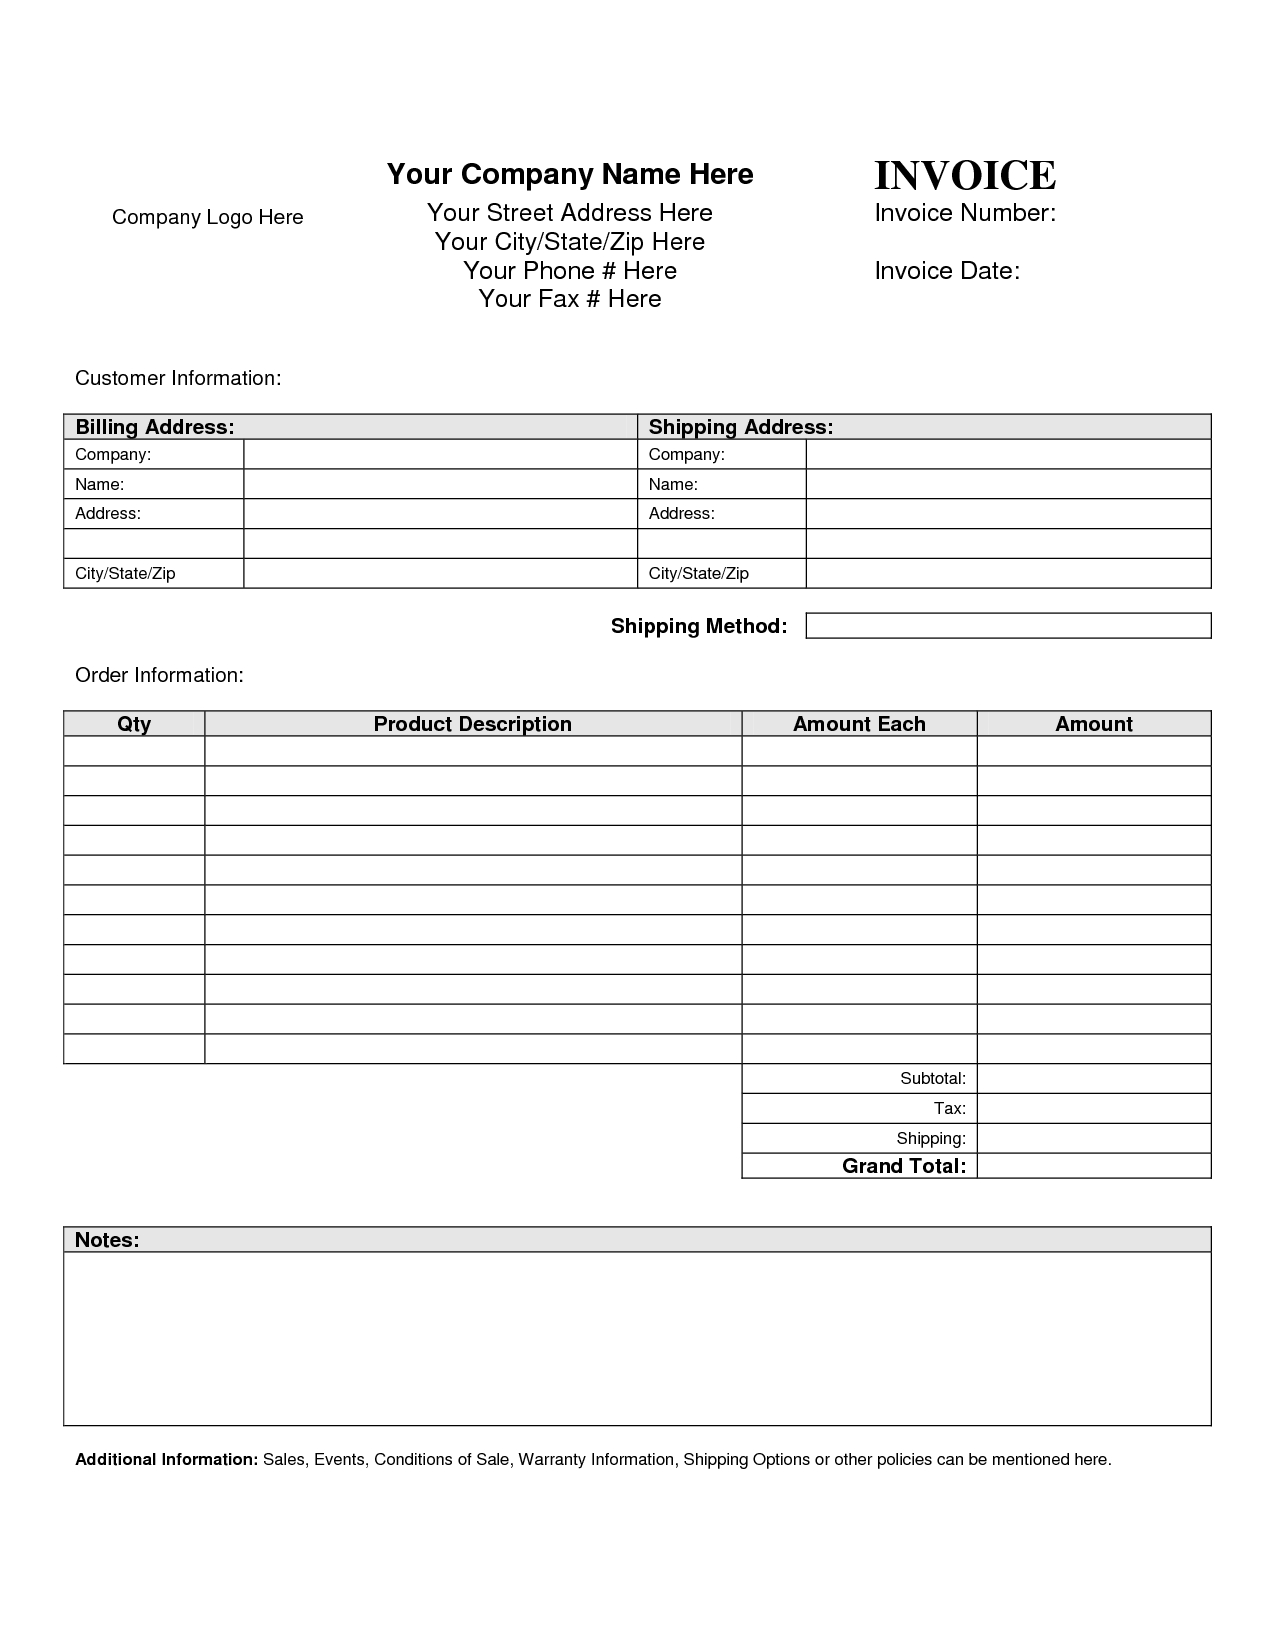 interim invoice definition invoigothaieasydnscom nice blank invoice template blankinvoiceorg 1275 X 1650